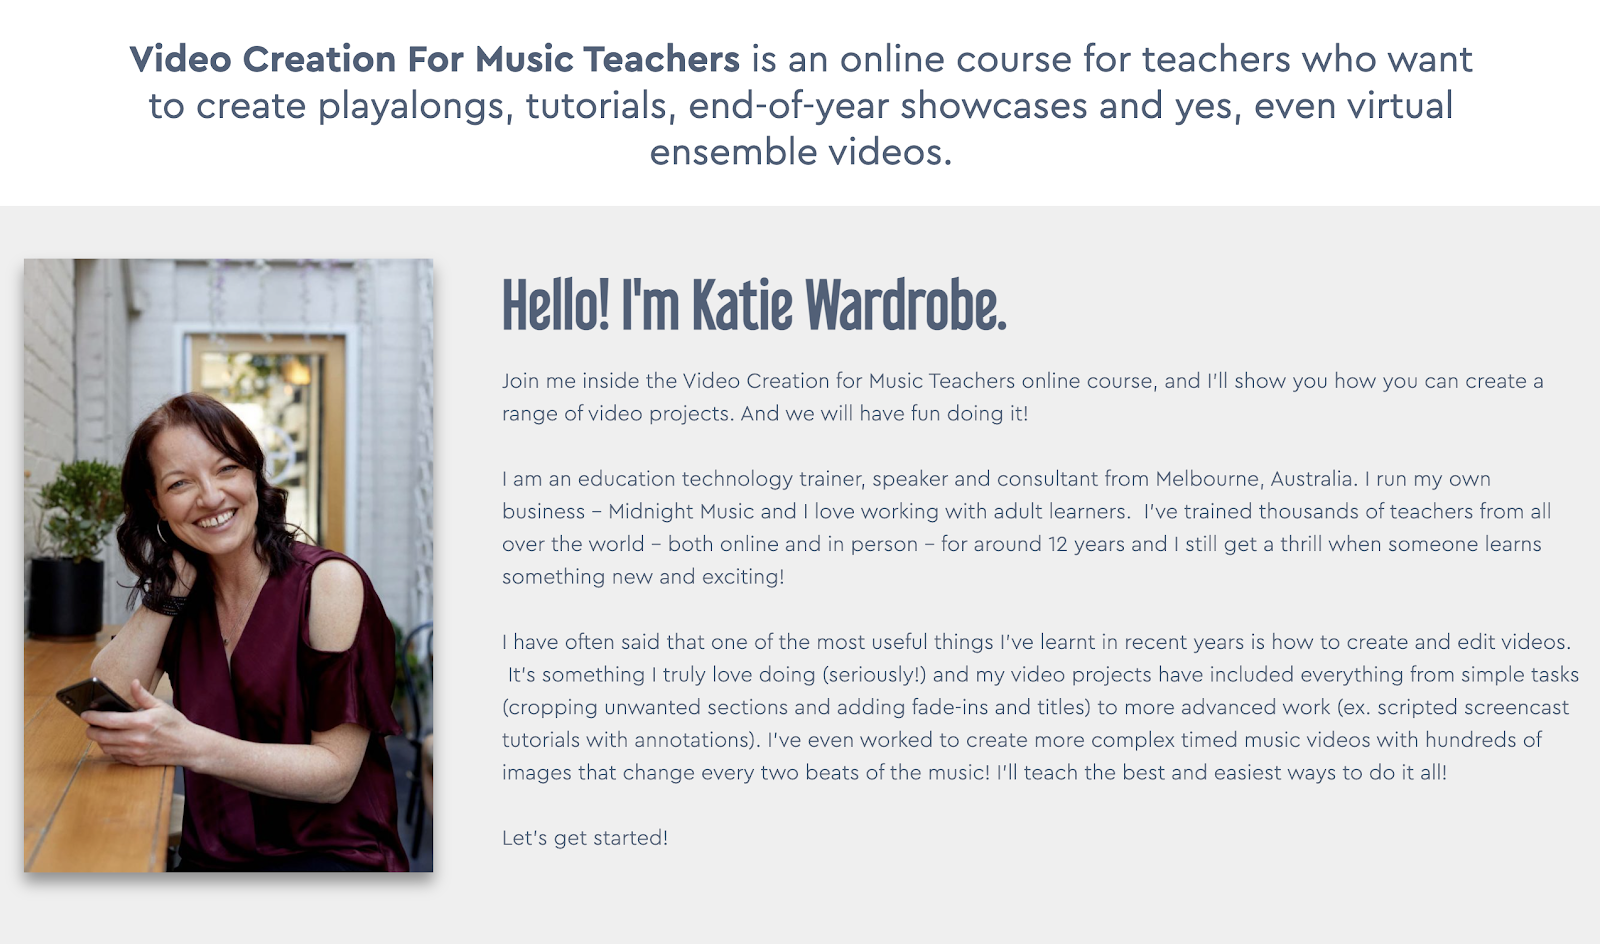 Video Creation for Music Teachers Online Course Katie Wardrobe